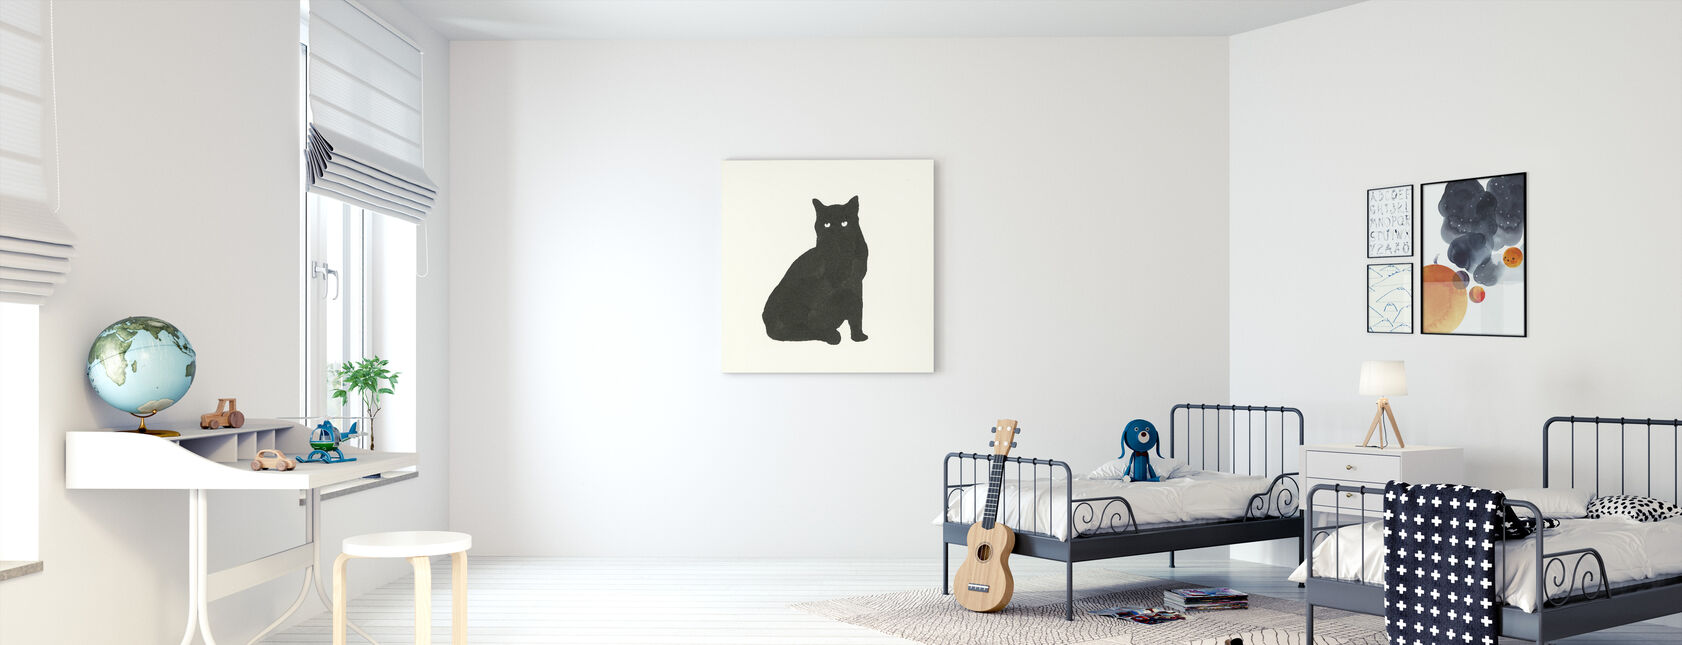 Black Cat - Canvas print - Kids Room